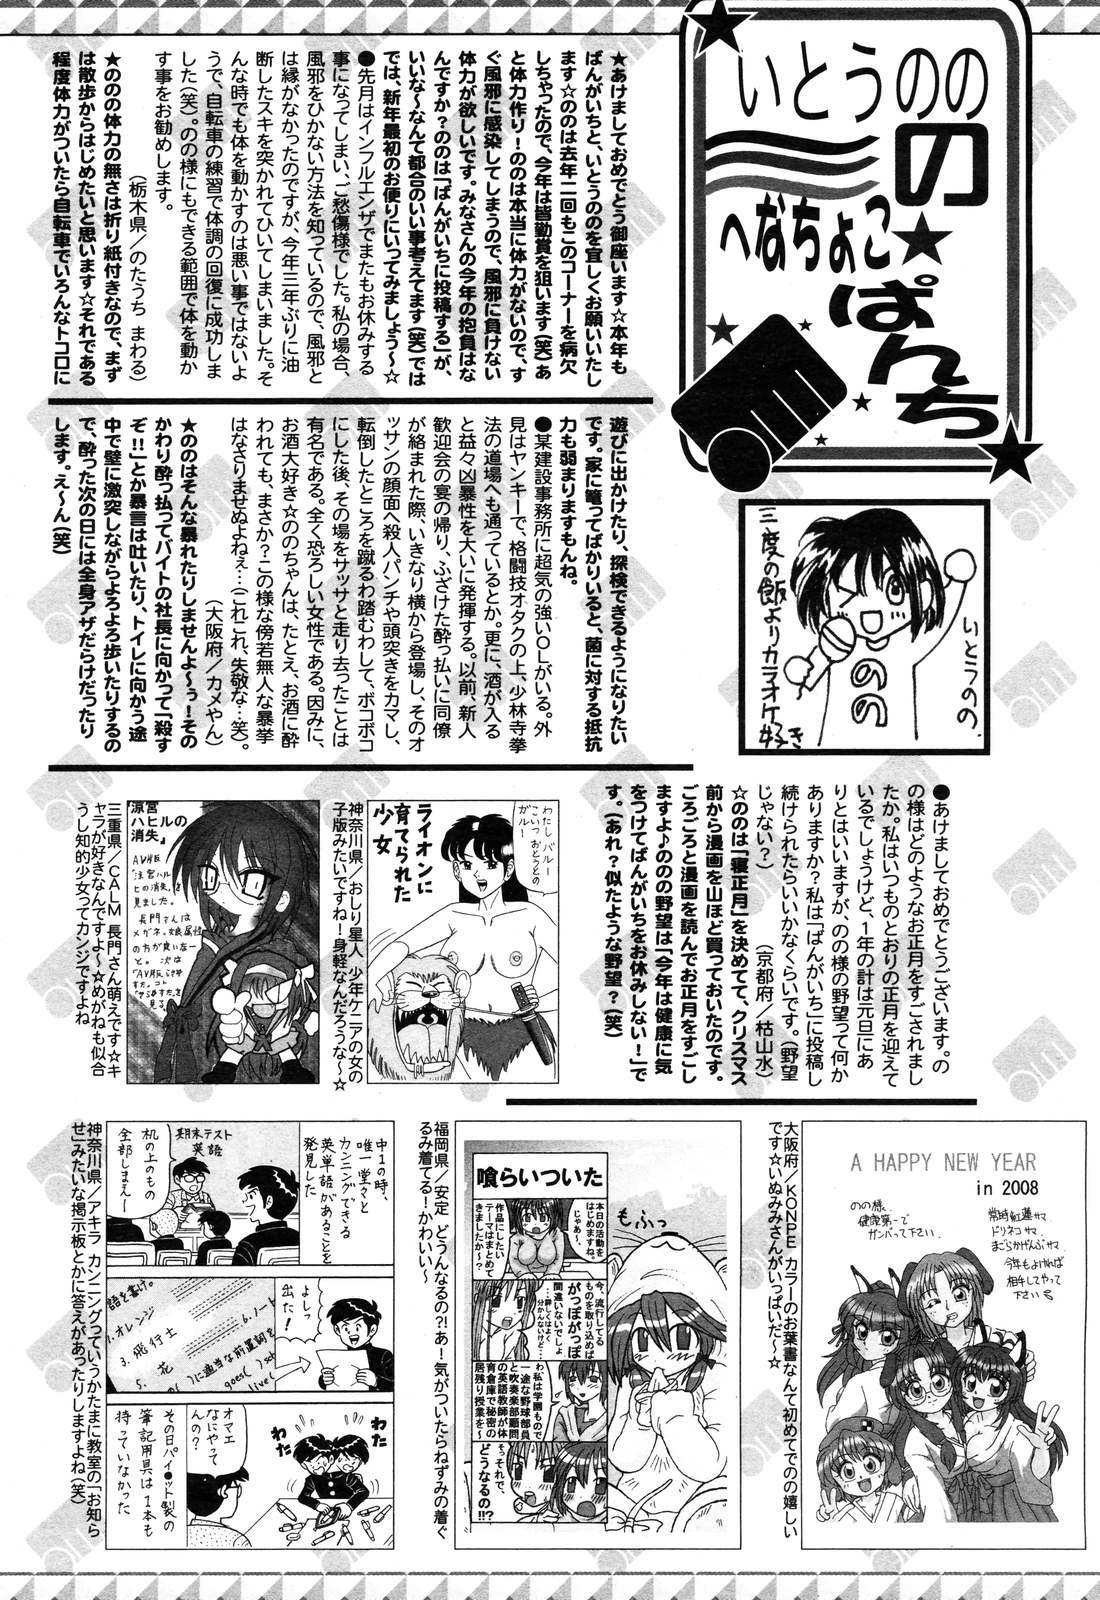 Manga Bangaichi 2008-03 257